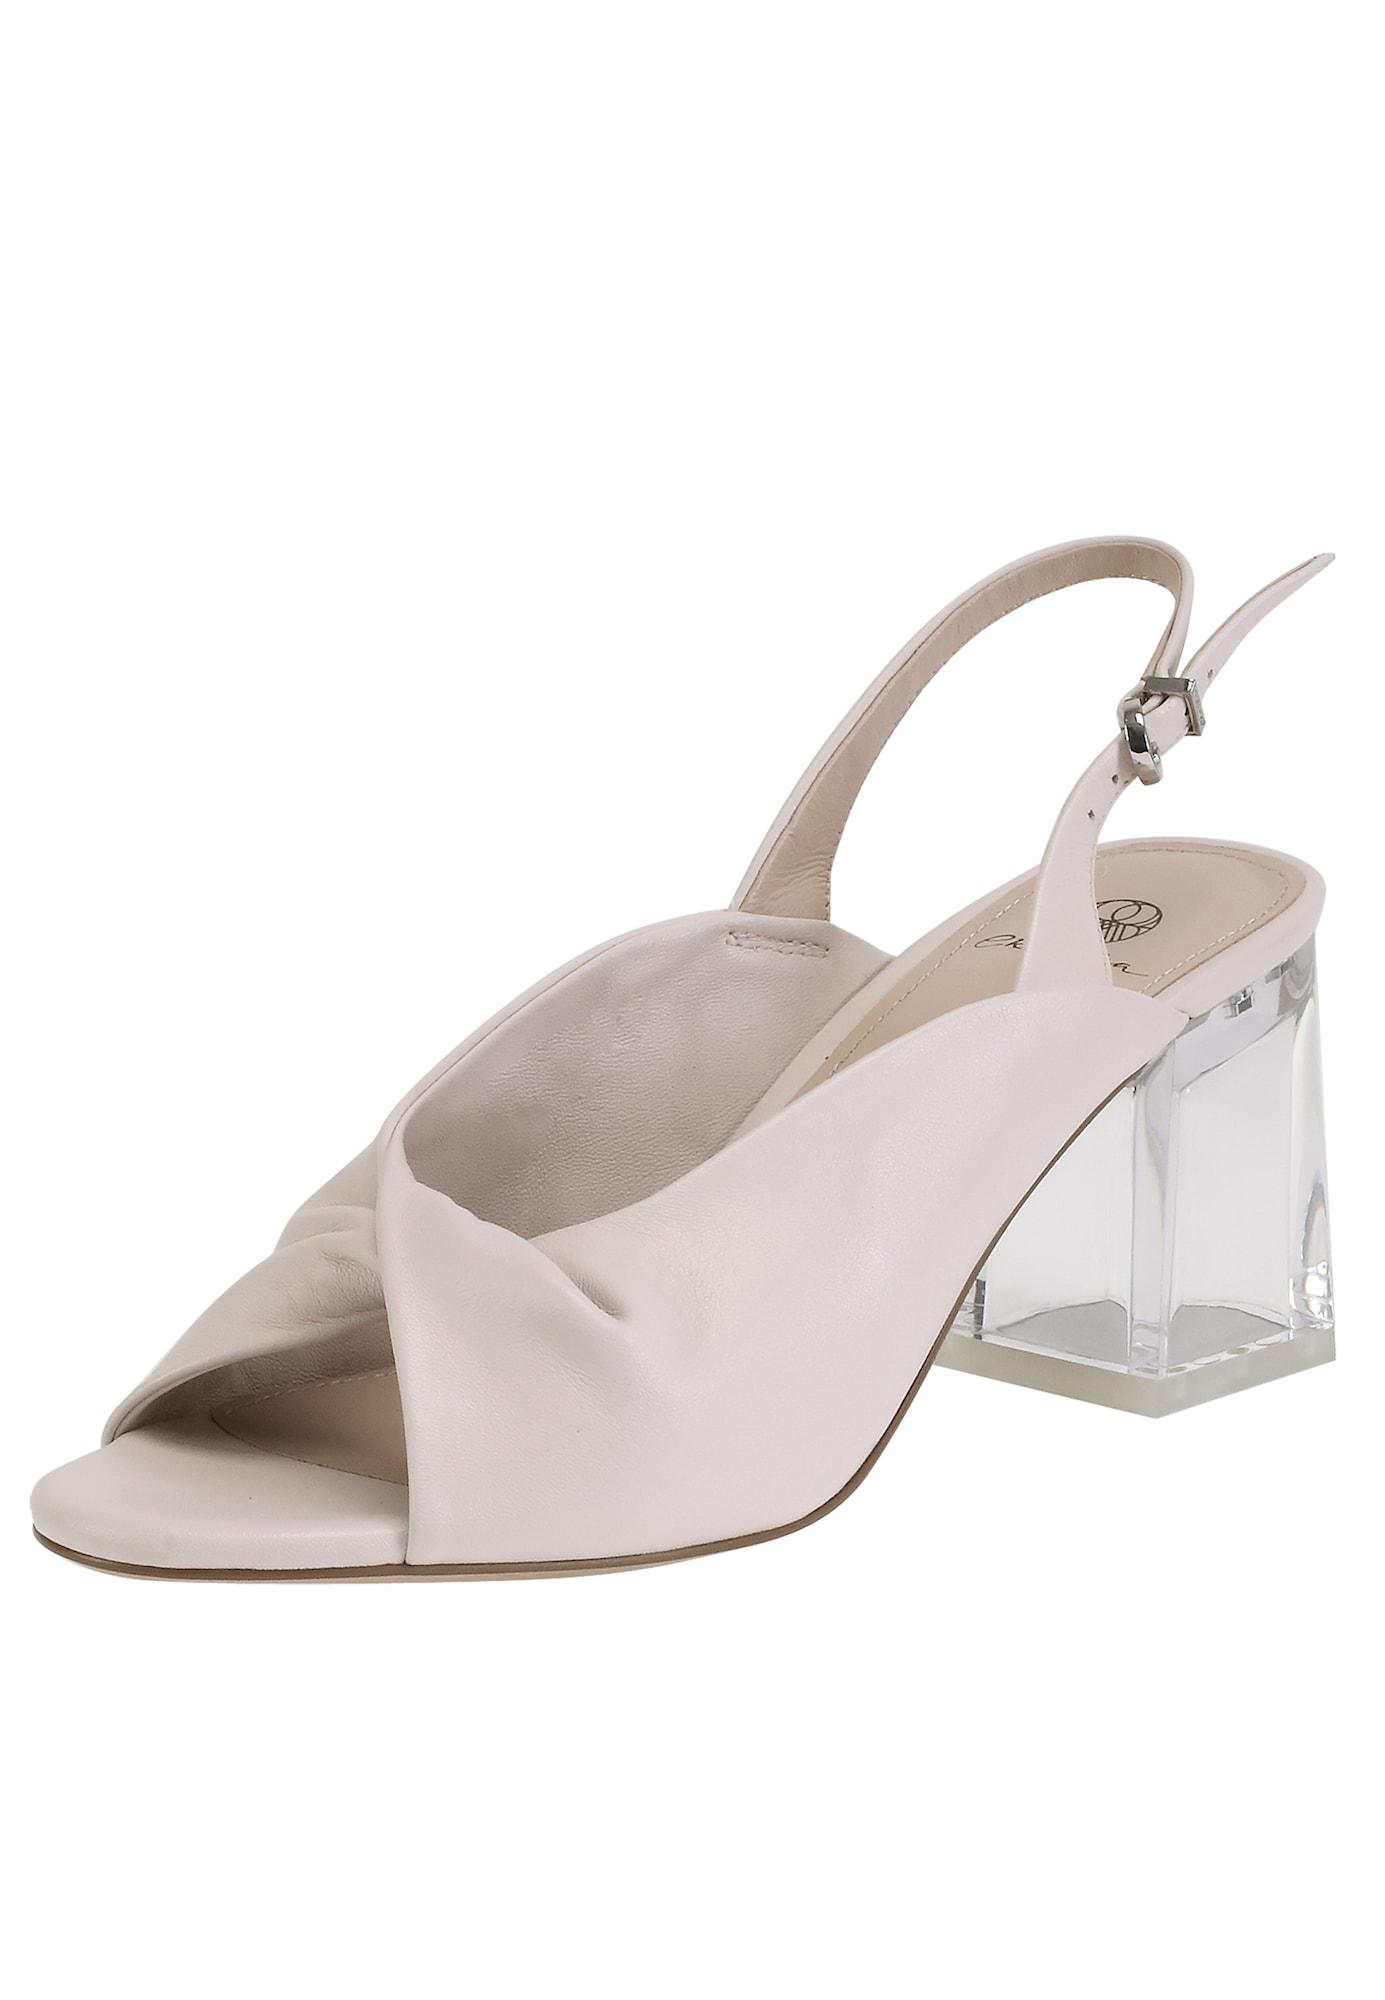 Peeptoes | Schuhe > Pumps > Peeptoes | Ekonika